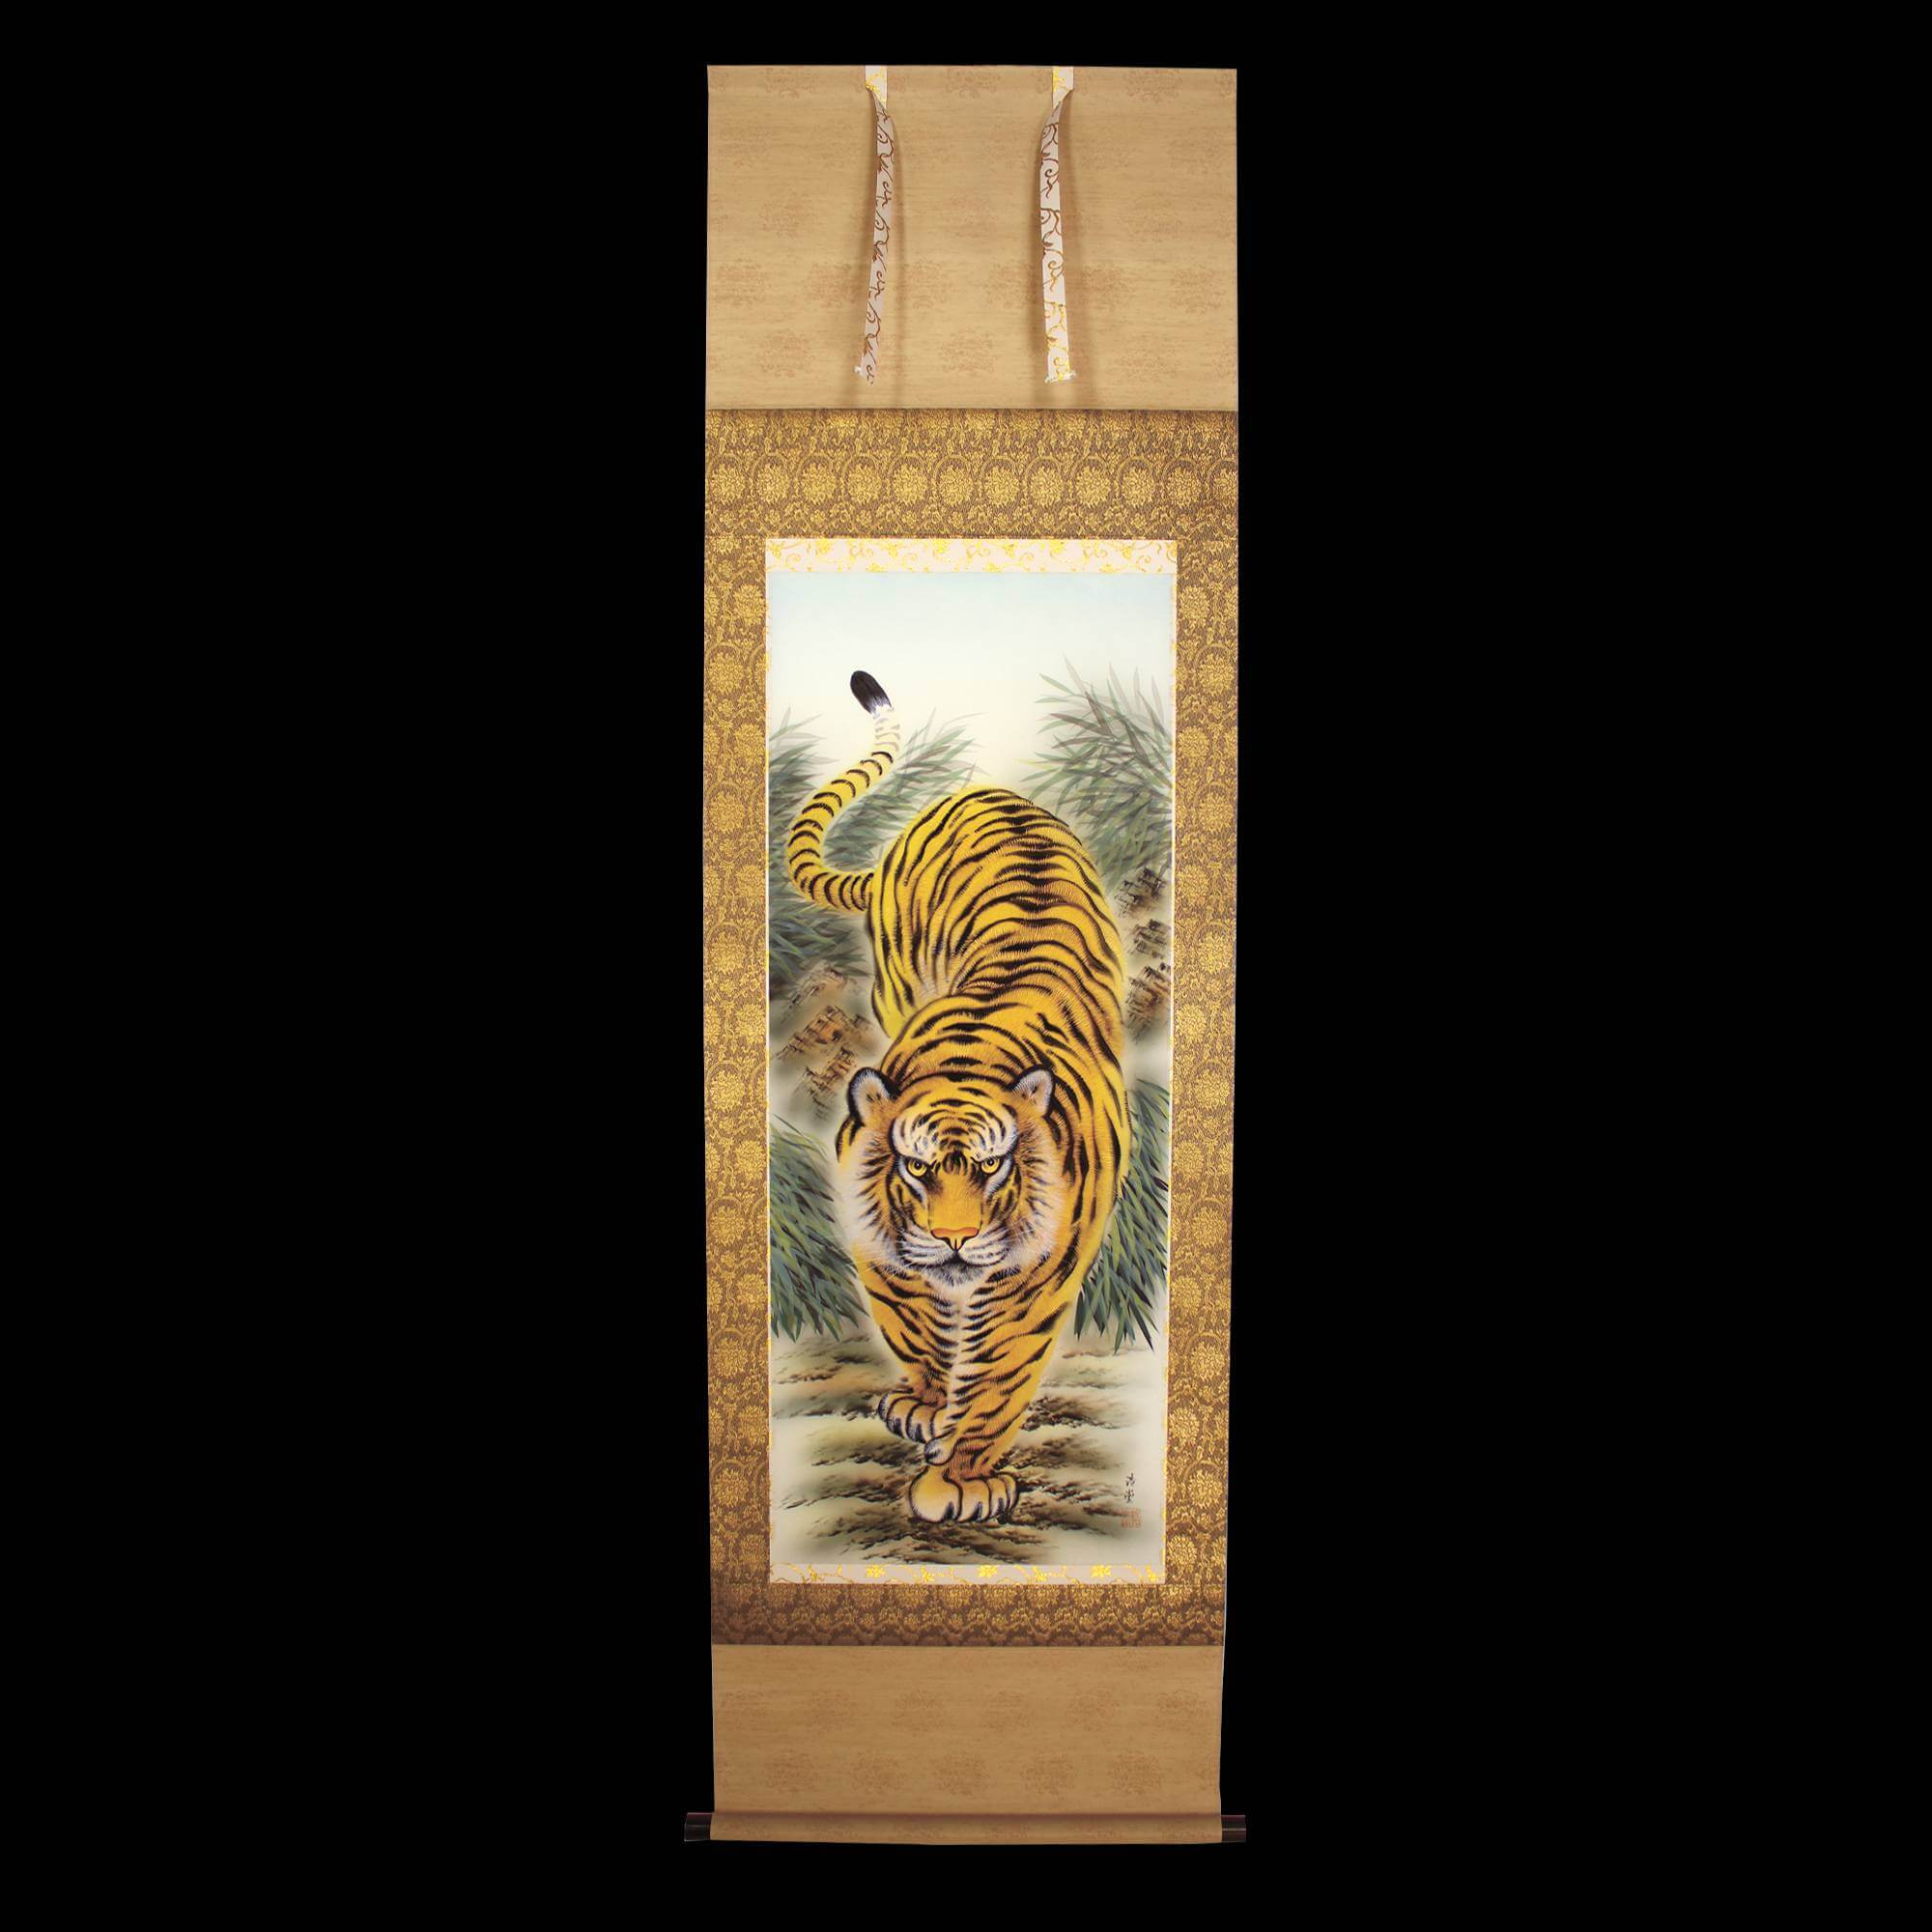 Tiger / Kōdō Sakurai